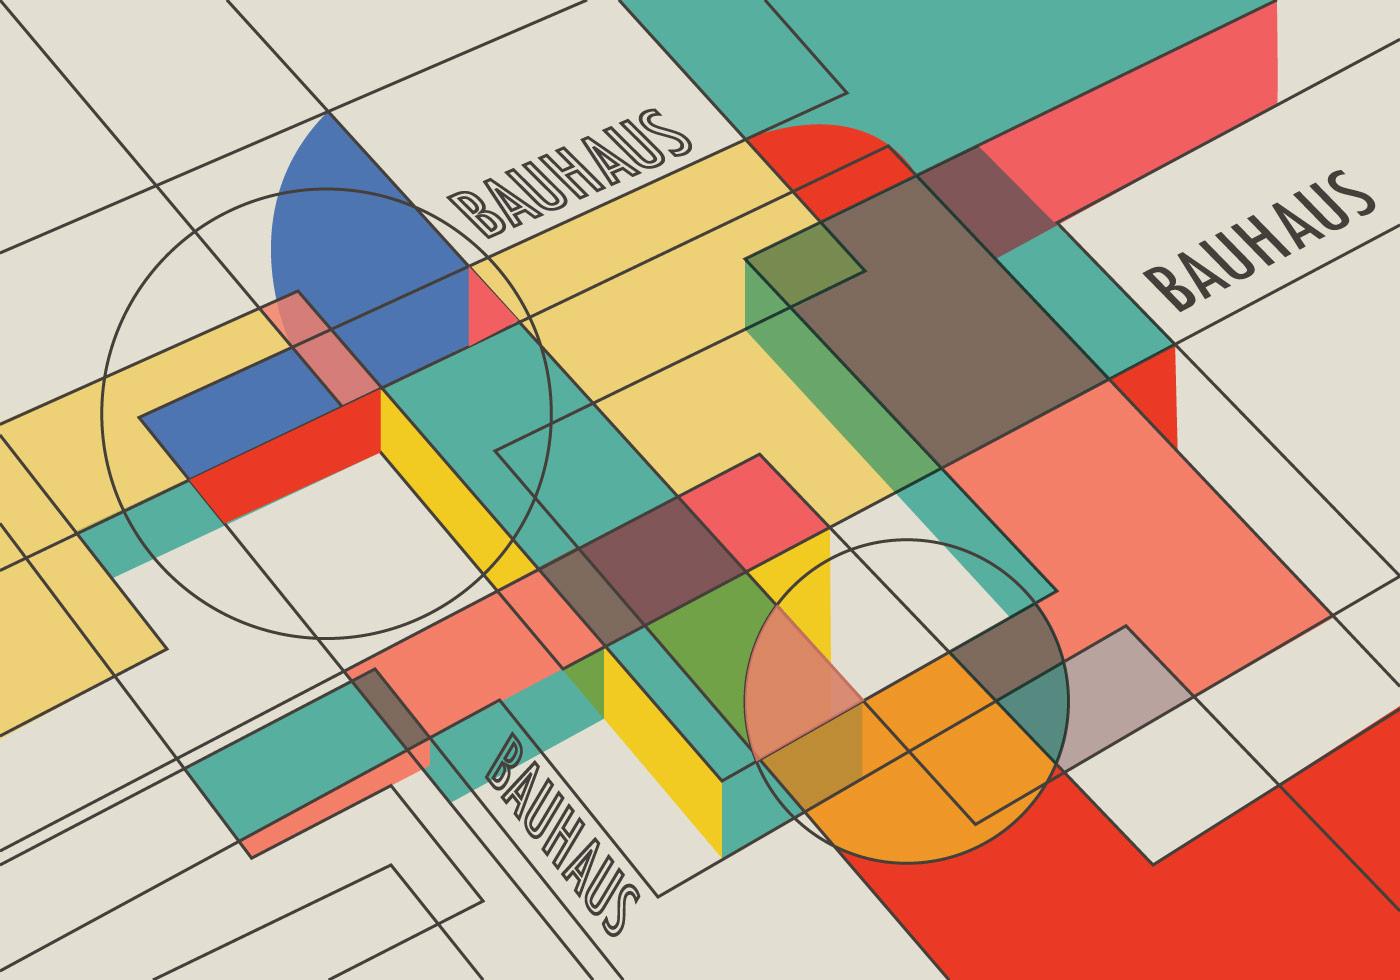 Bauhaus Graphic